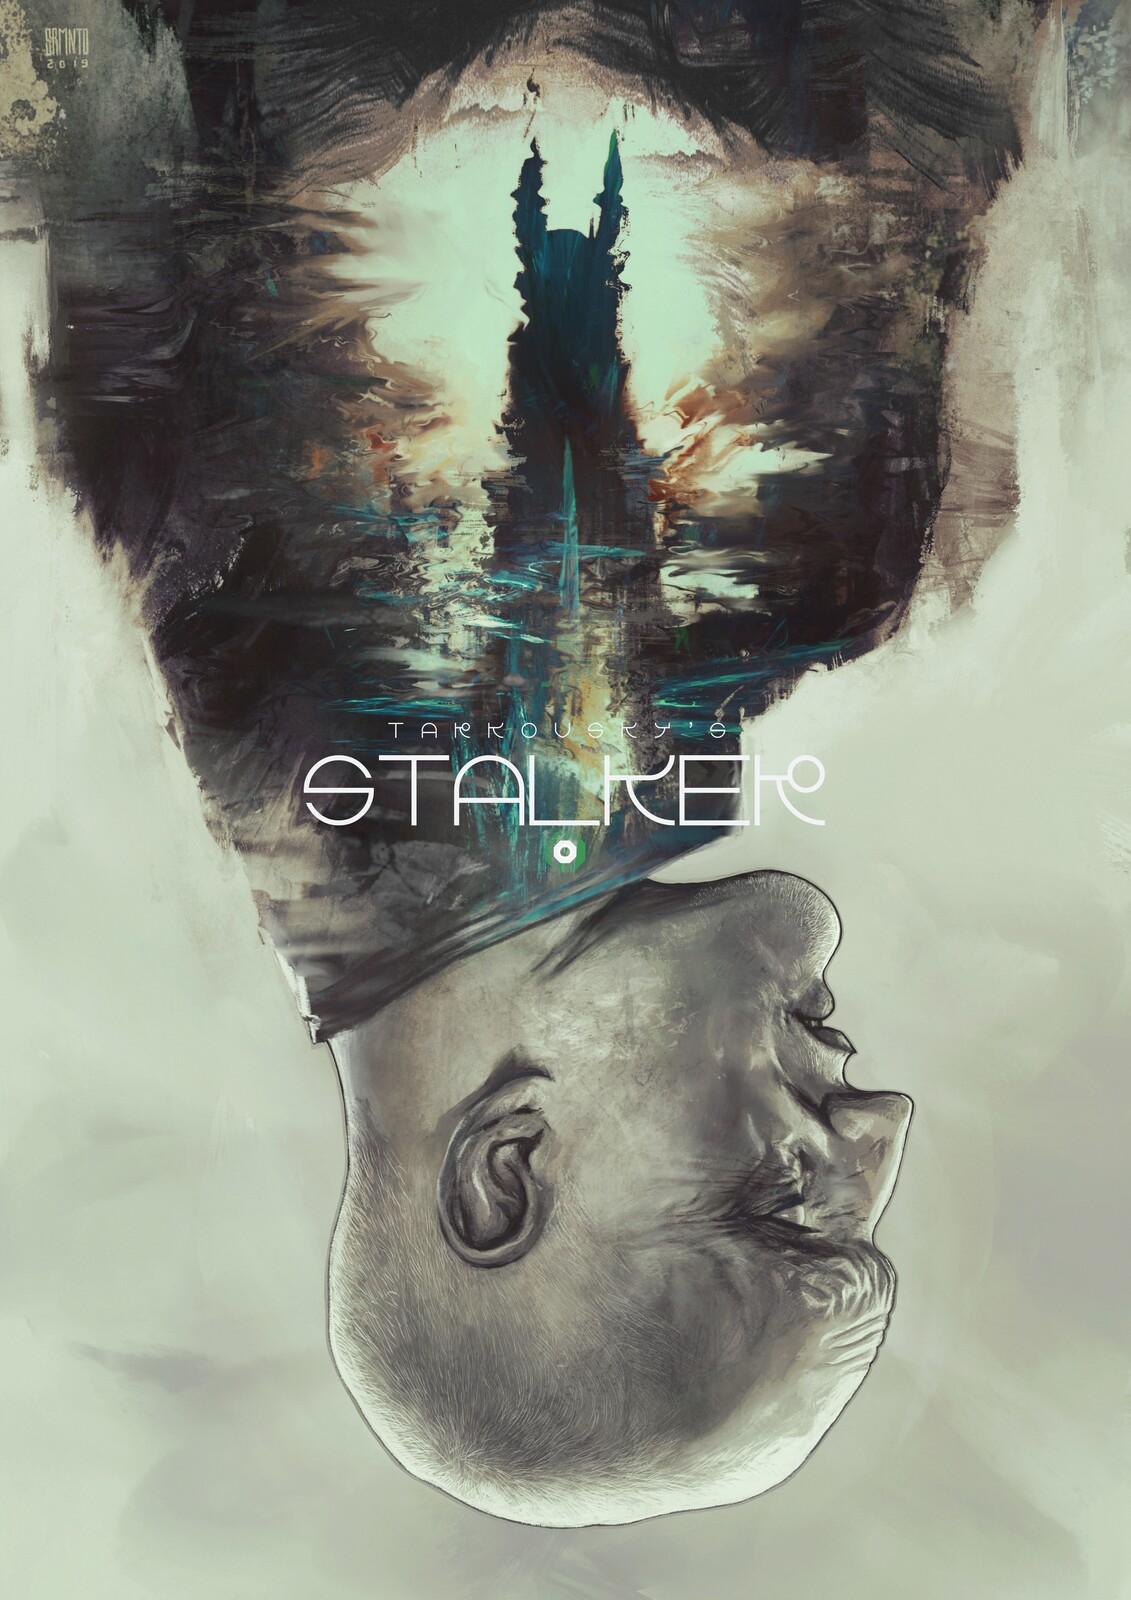 Tarkovsky's Stalker | Poster Experiment